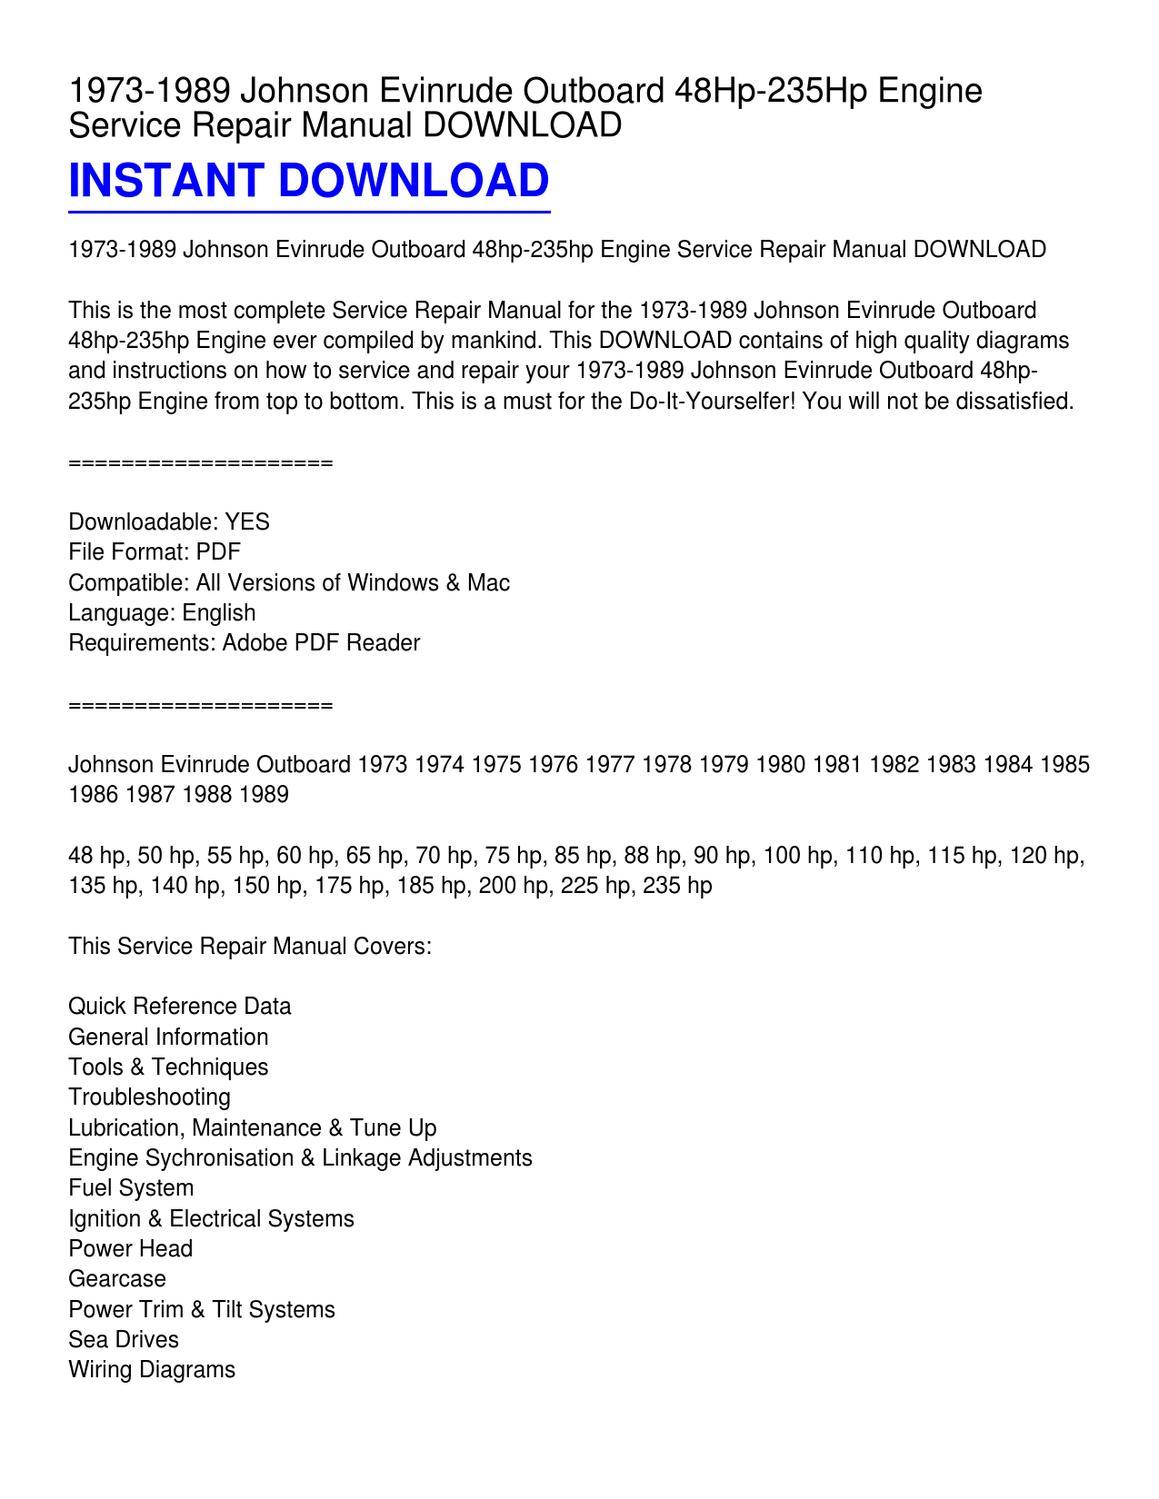 Mh 0344 1989 70 Hp Evinrude Wiring Diagram Download Diagram